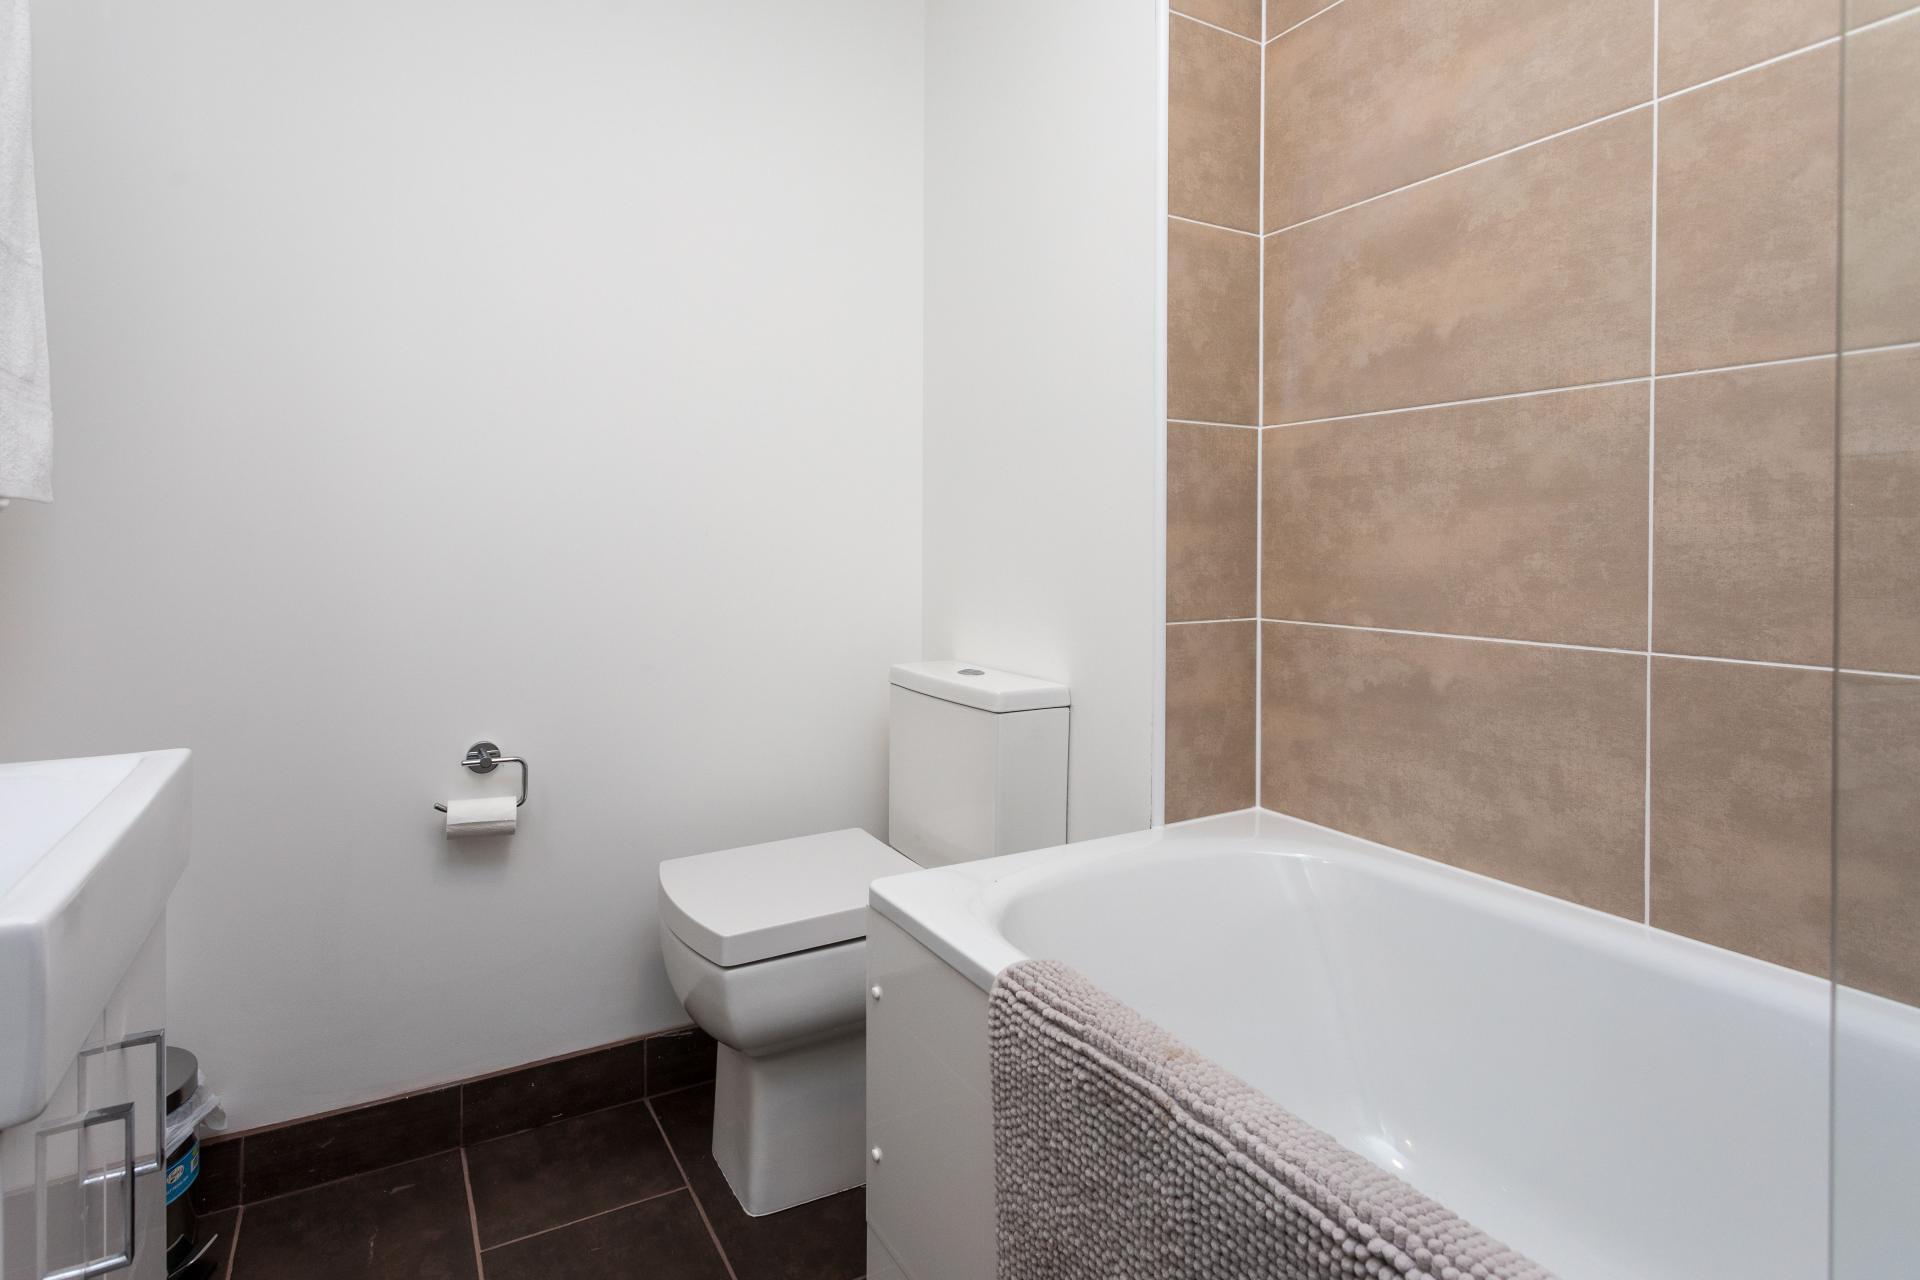 Bathroom at Sutherland Quarters, Three Bridges, Crawley